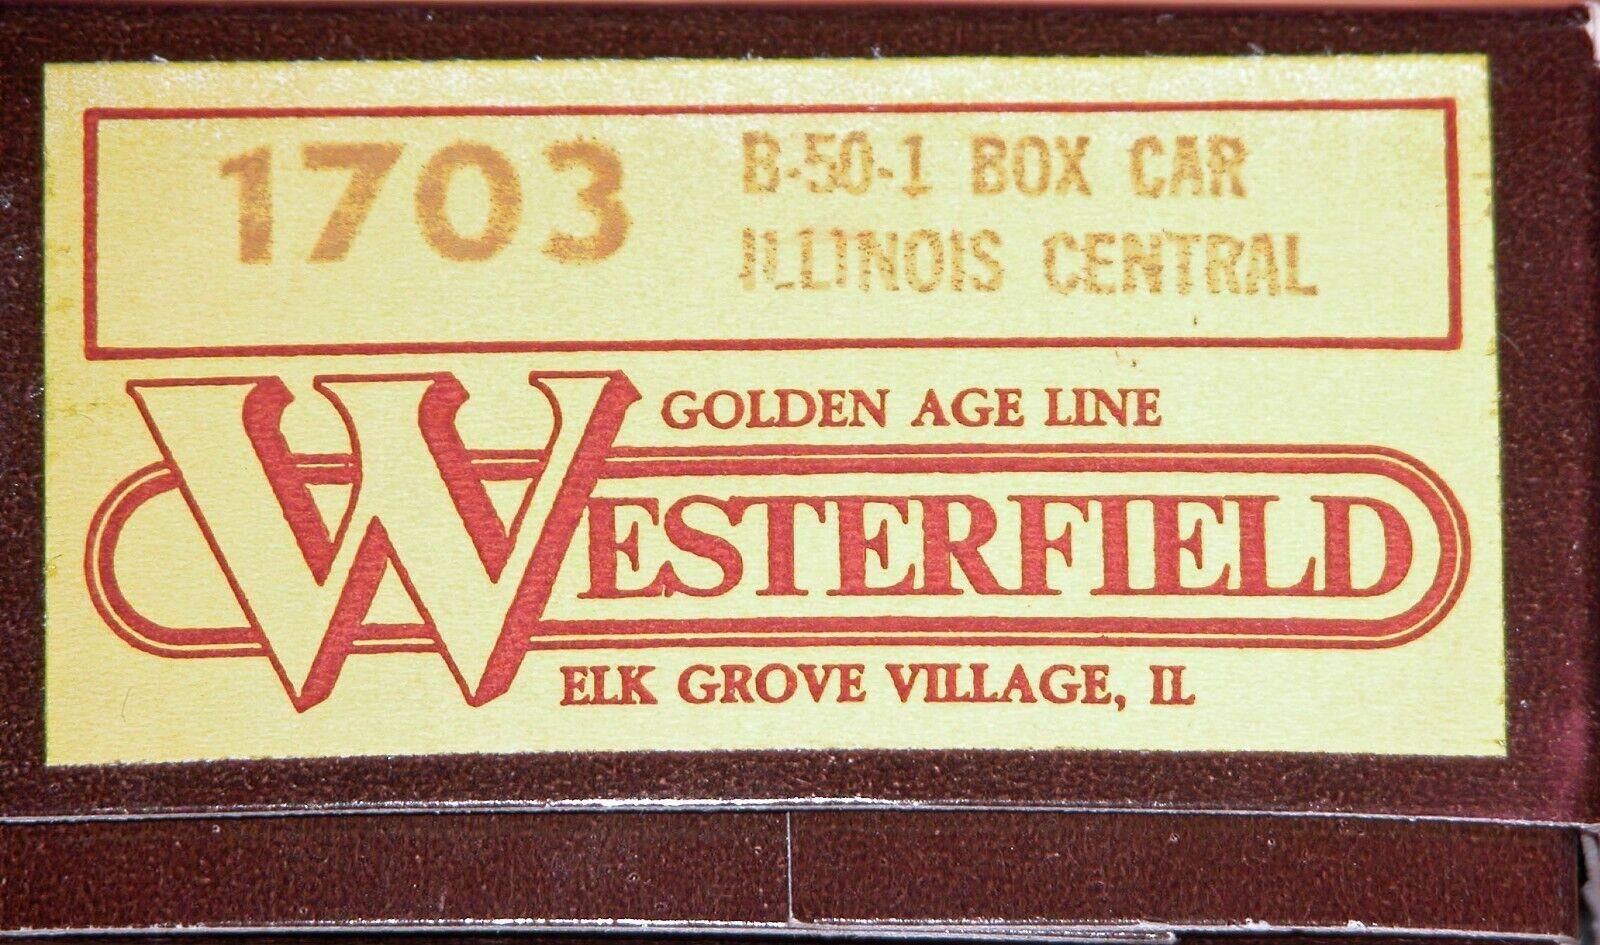 WESTERFIELD 1703 B-50-1 BOX CAR ILLINOIS CENTRAL